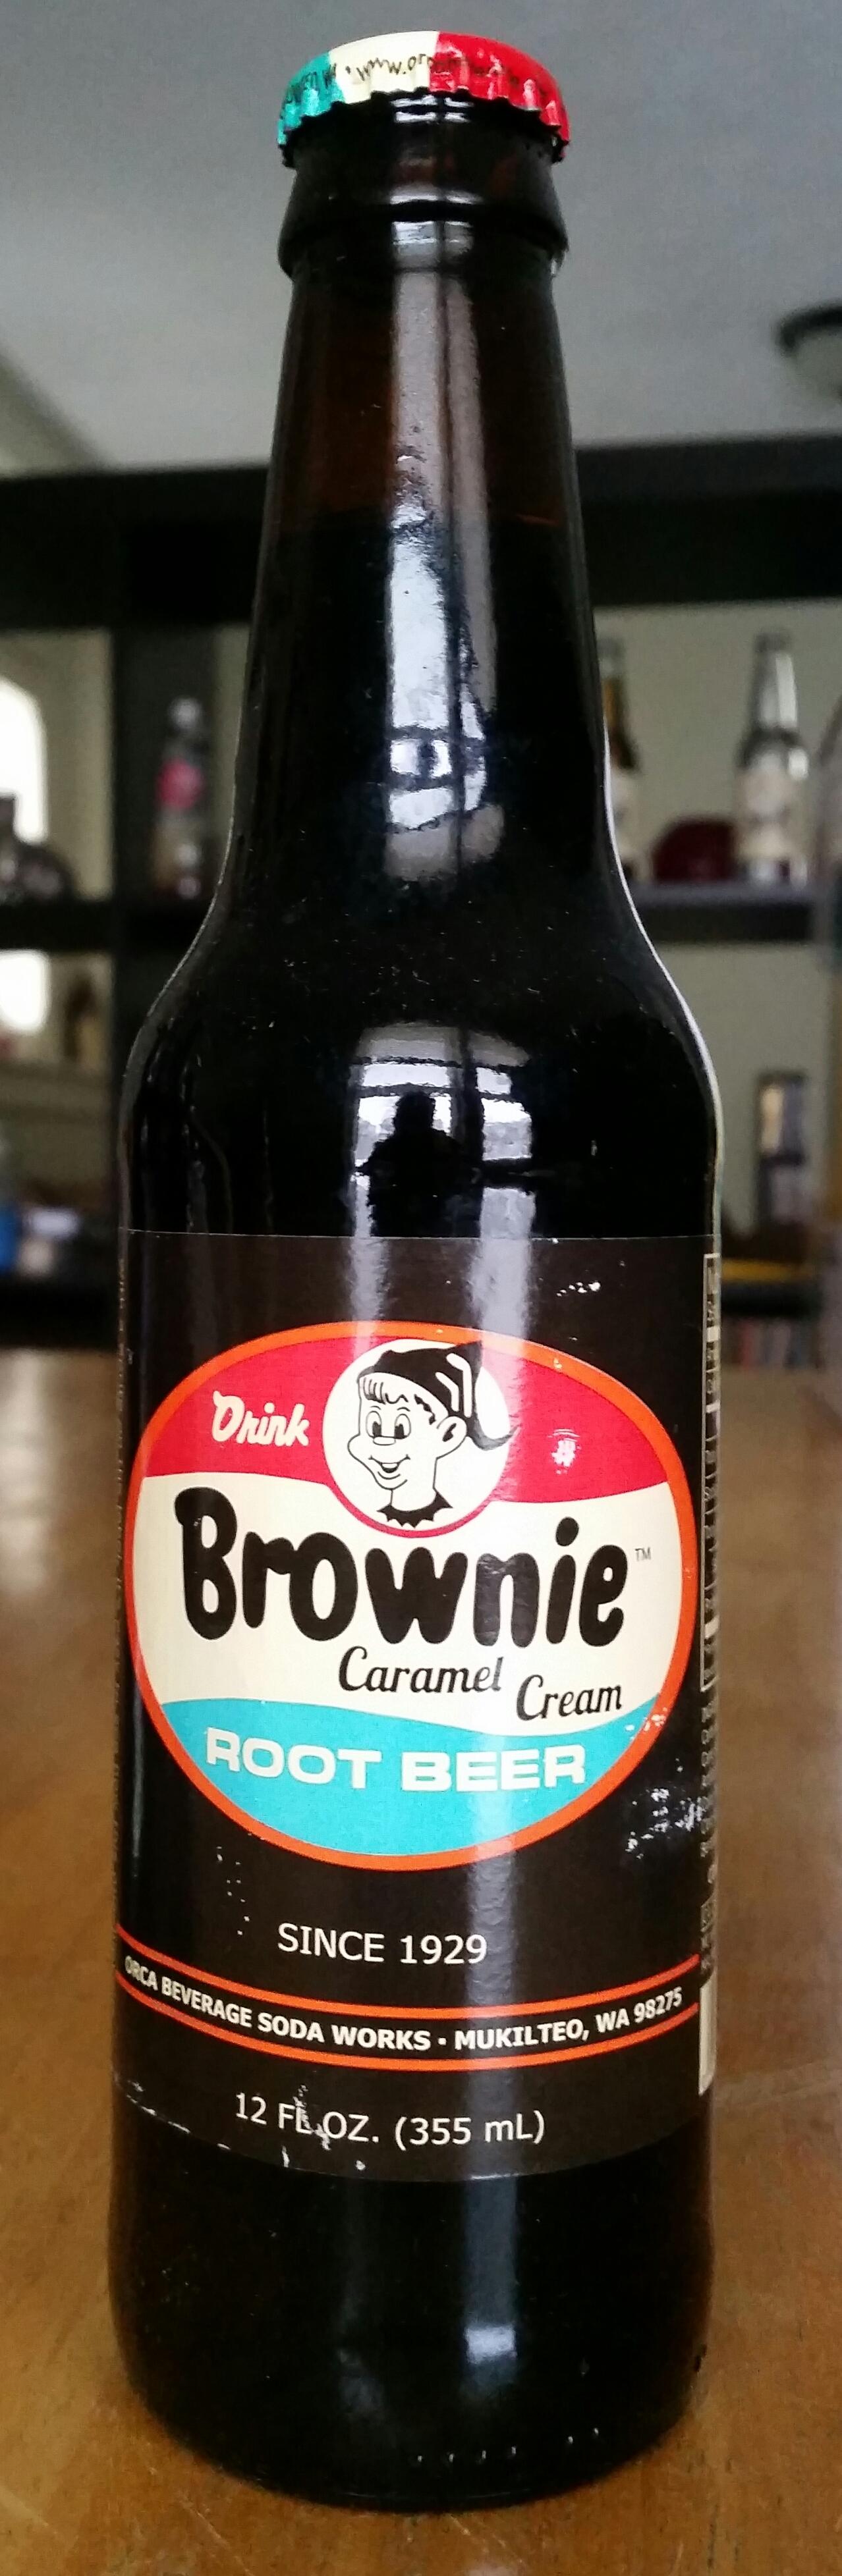 Thirsty dudes brownie caramel cream root beer brownie caramel cream root beer malvernweather Gallery